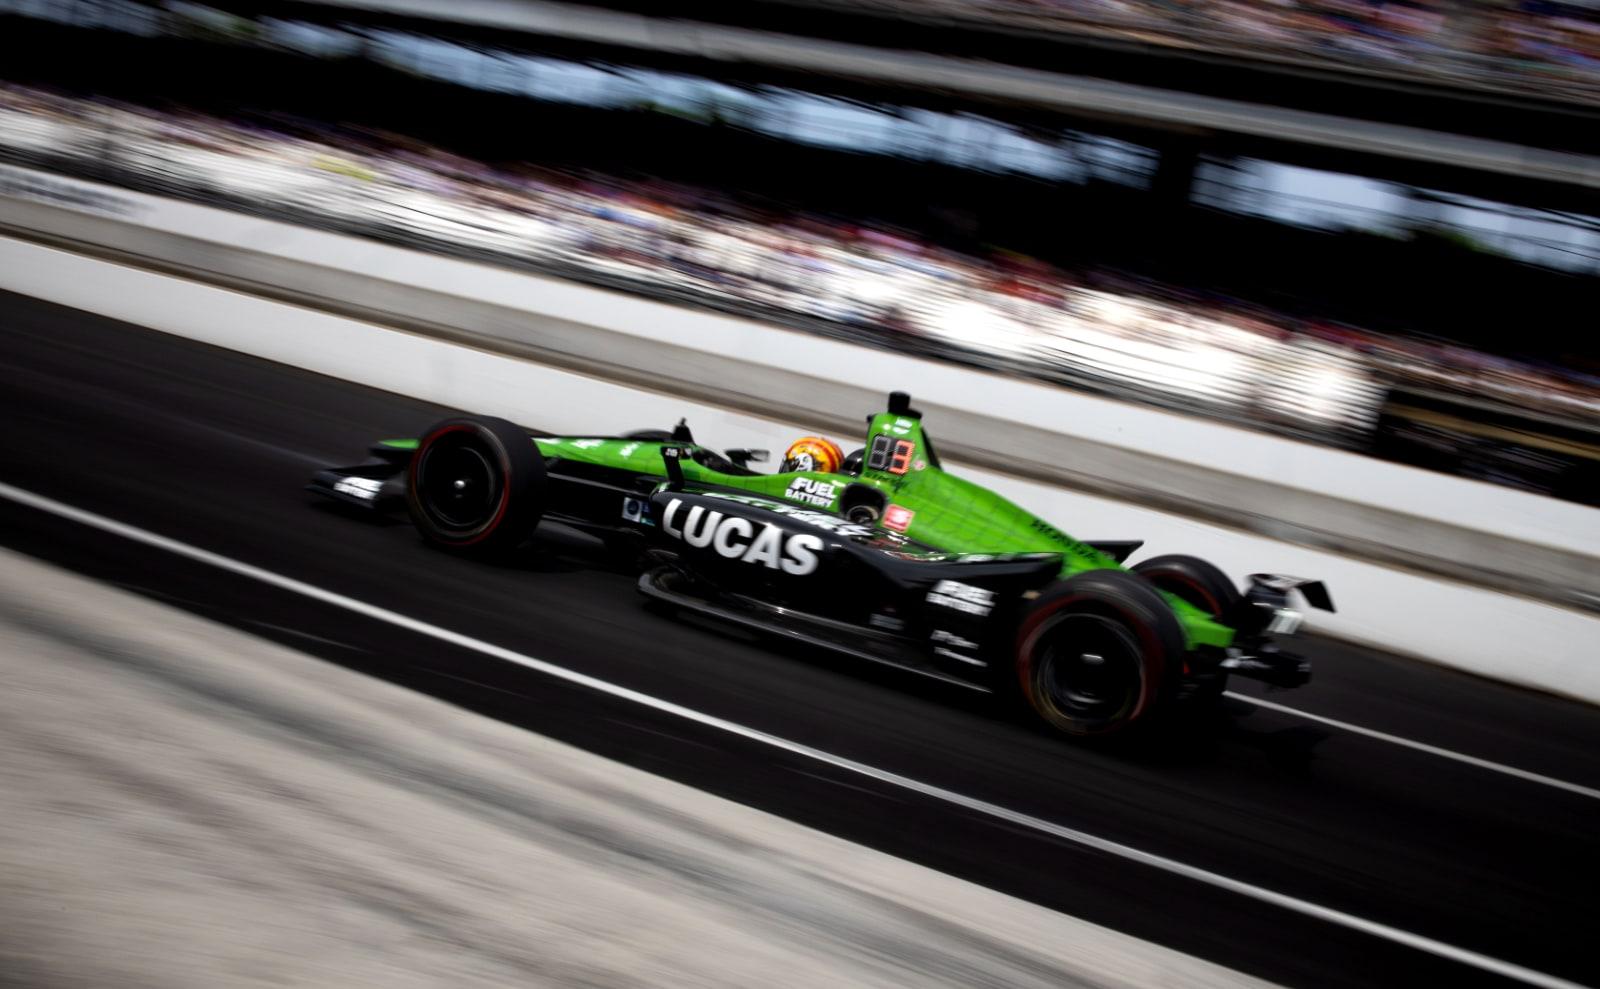 Oriol Servia rolls Lucas SPM Indy car down IMS pit lane